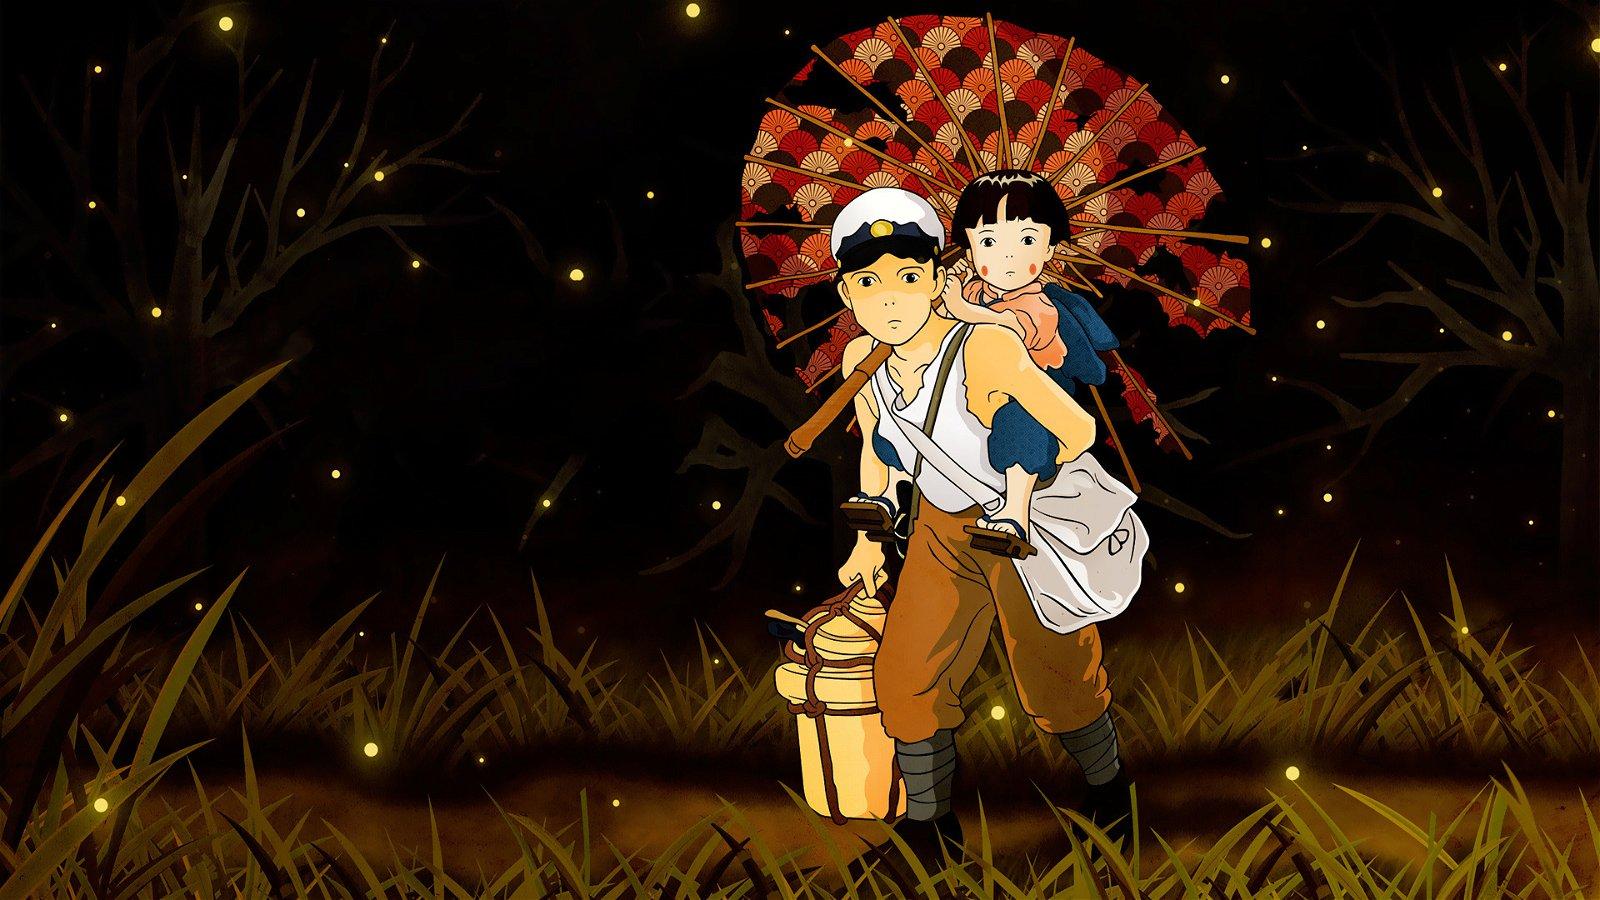 Isao Takahata, Co-Founder of Studio Ghibli, Passes Away at 82 1